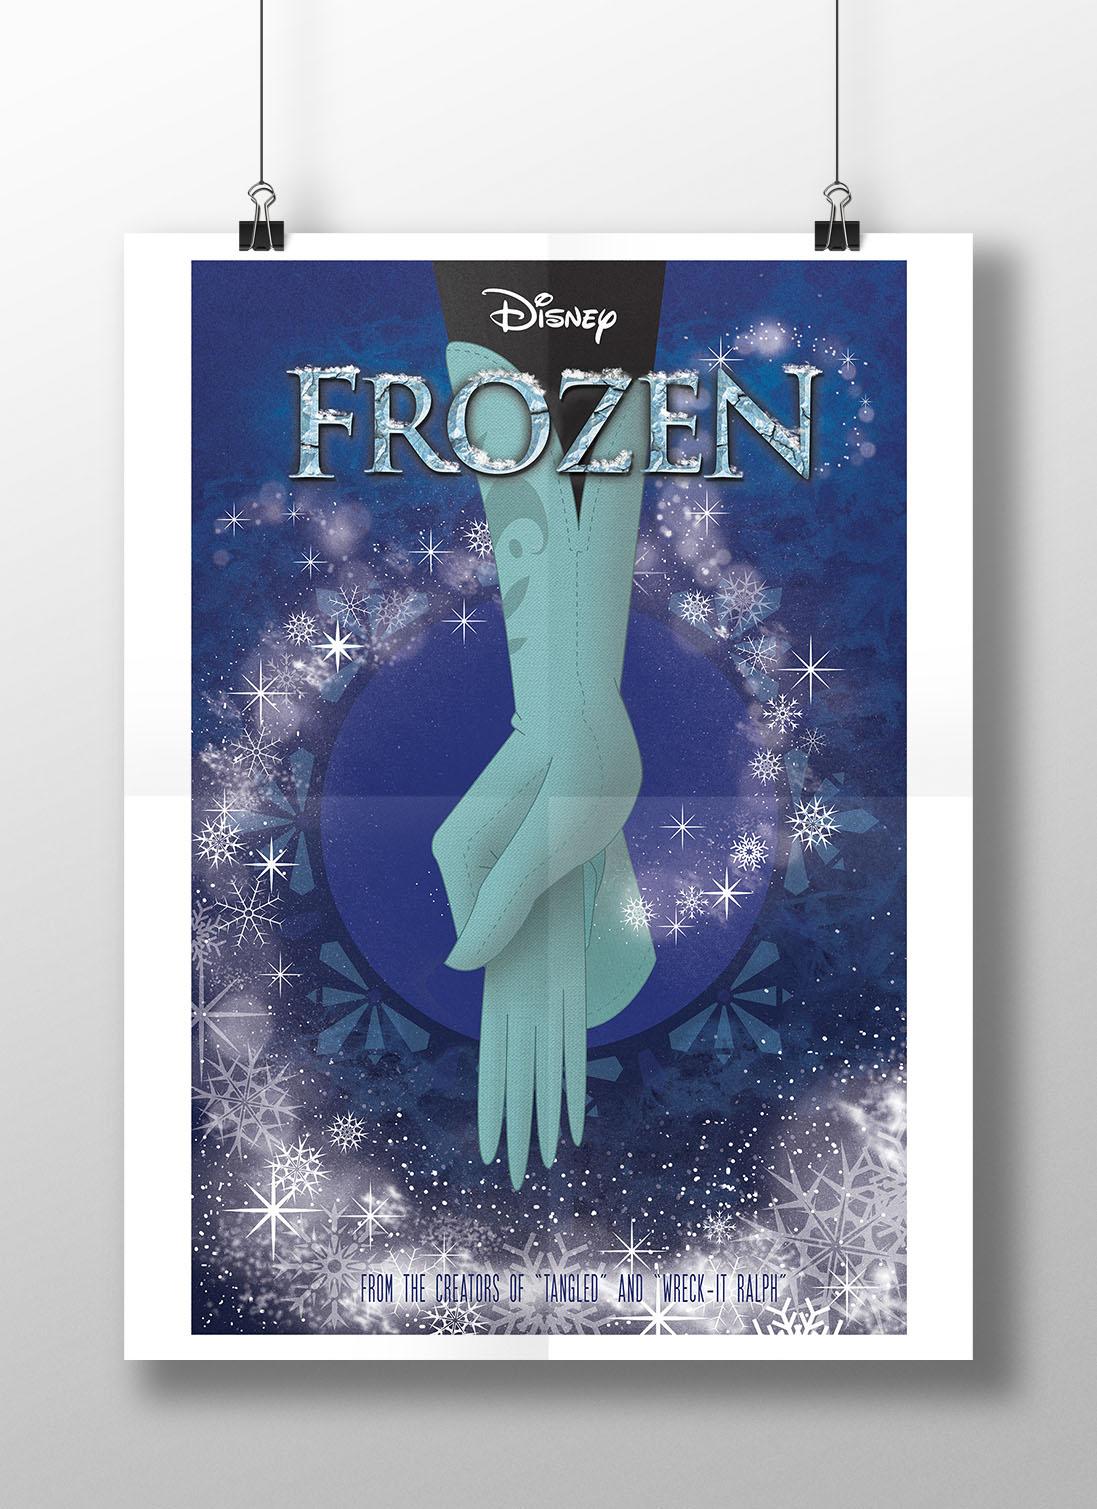 Frozen_poster_mockup.jpg